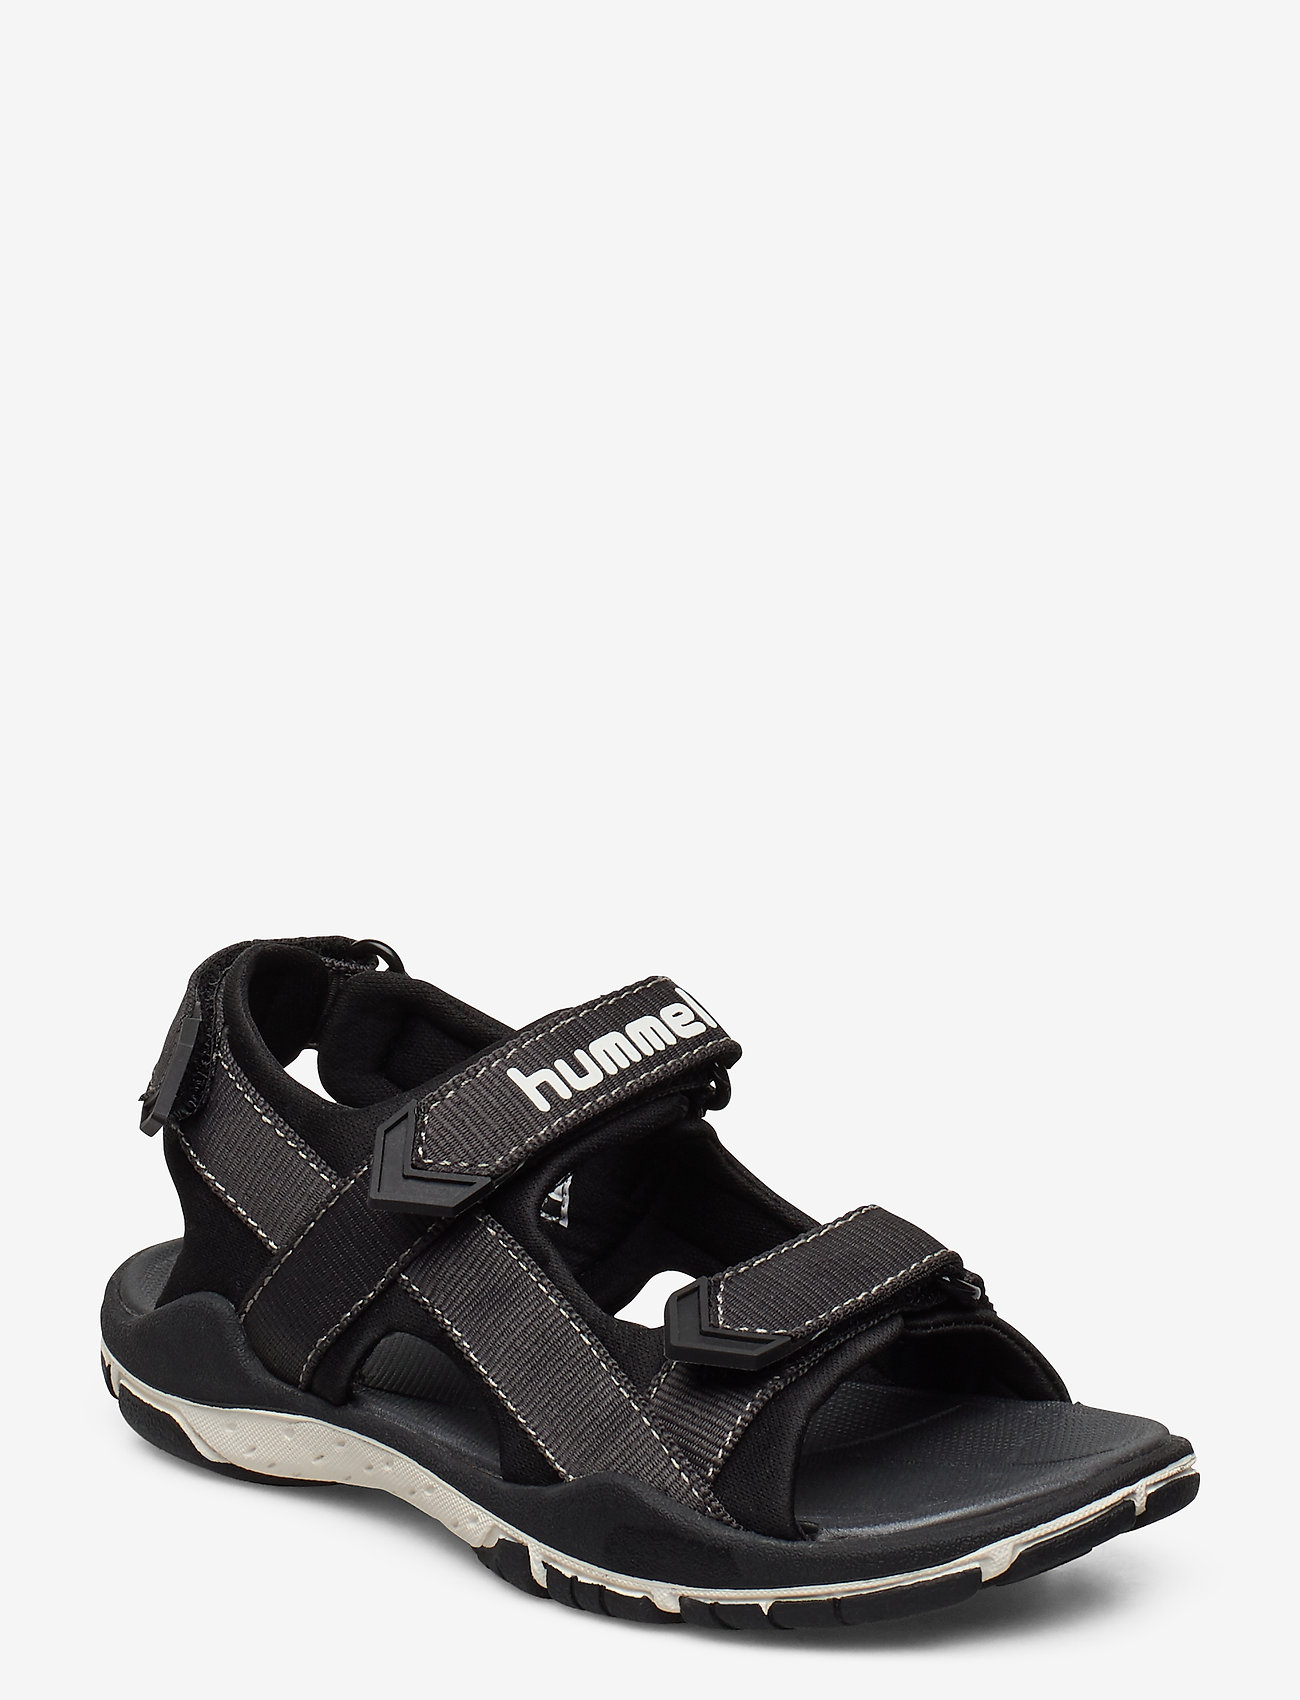 Hummel - SANDAL TREKKING 2 JR - sandals - asphalt